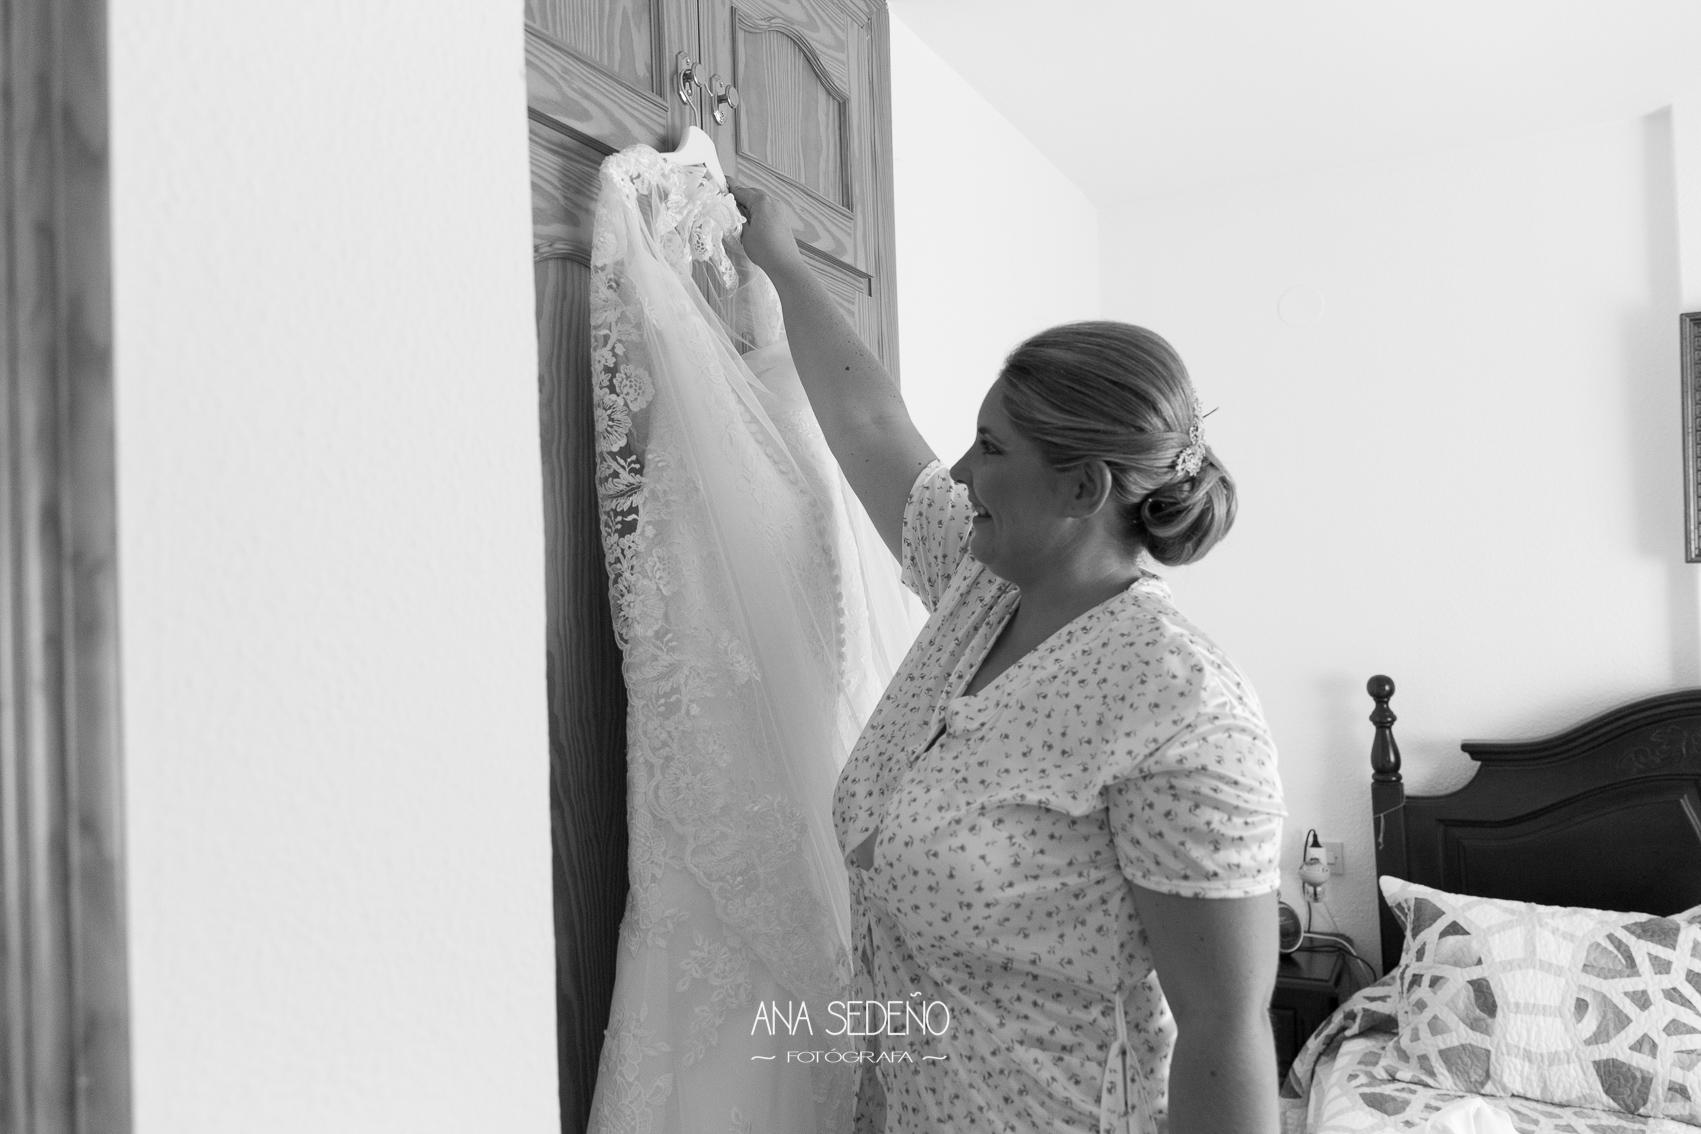 Ana Sedeño Fotografa.-Boda A&V0257